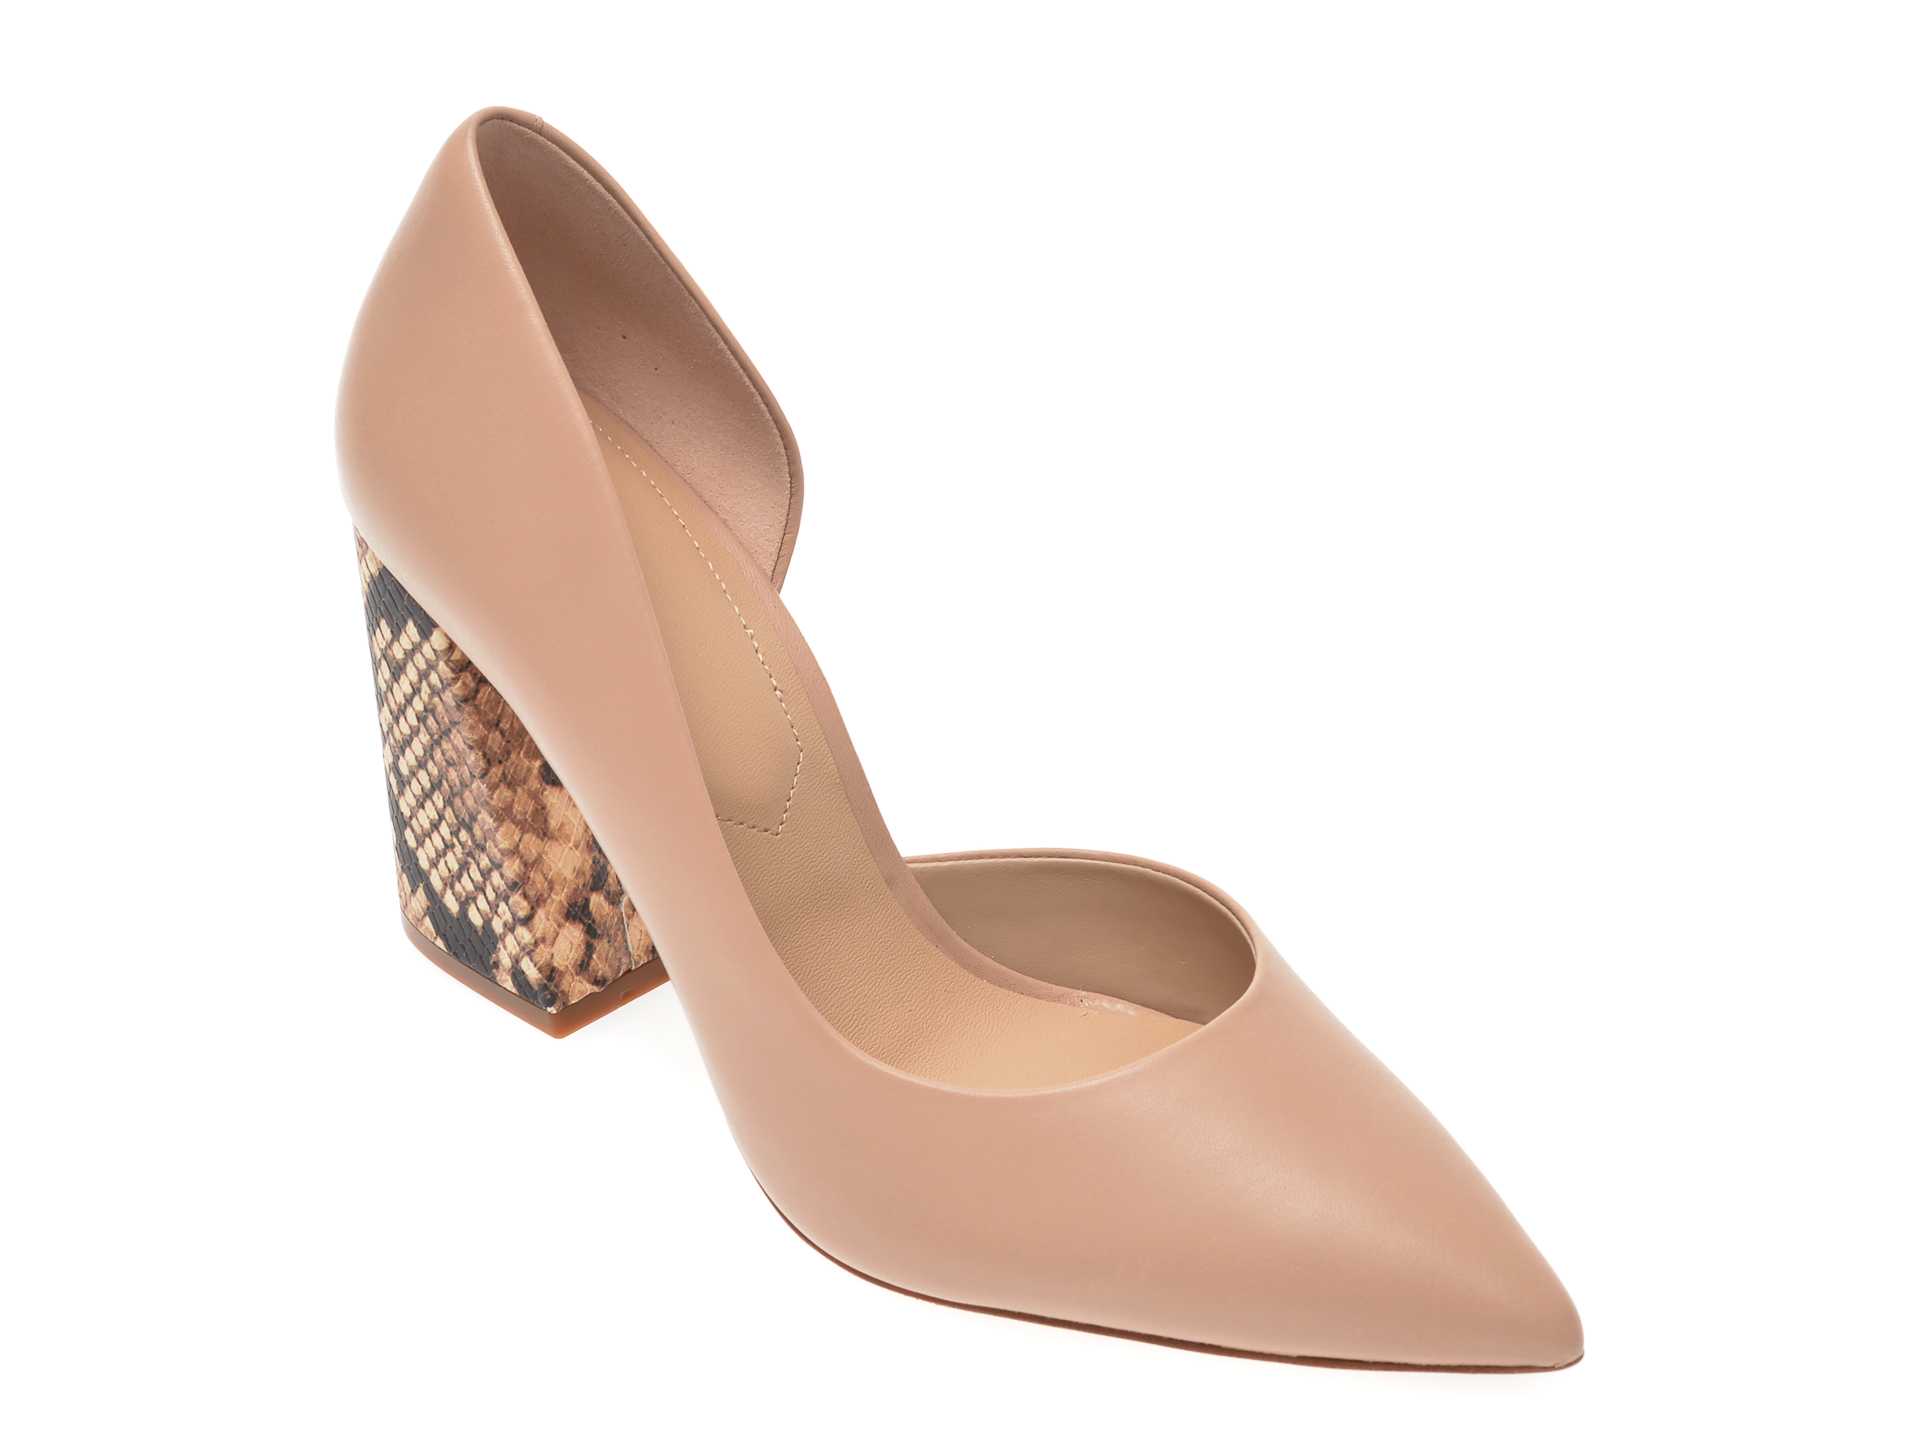 Pantofi ALDO nude, Ushari270, din piele naturala